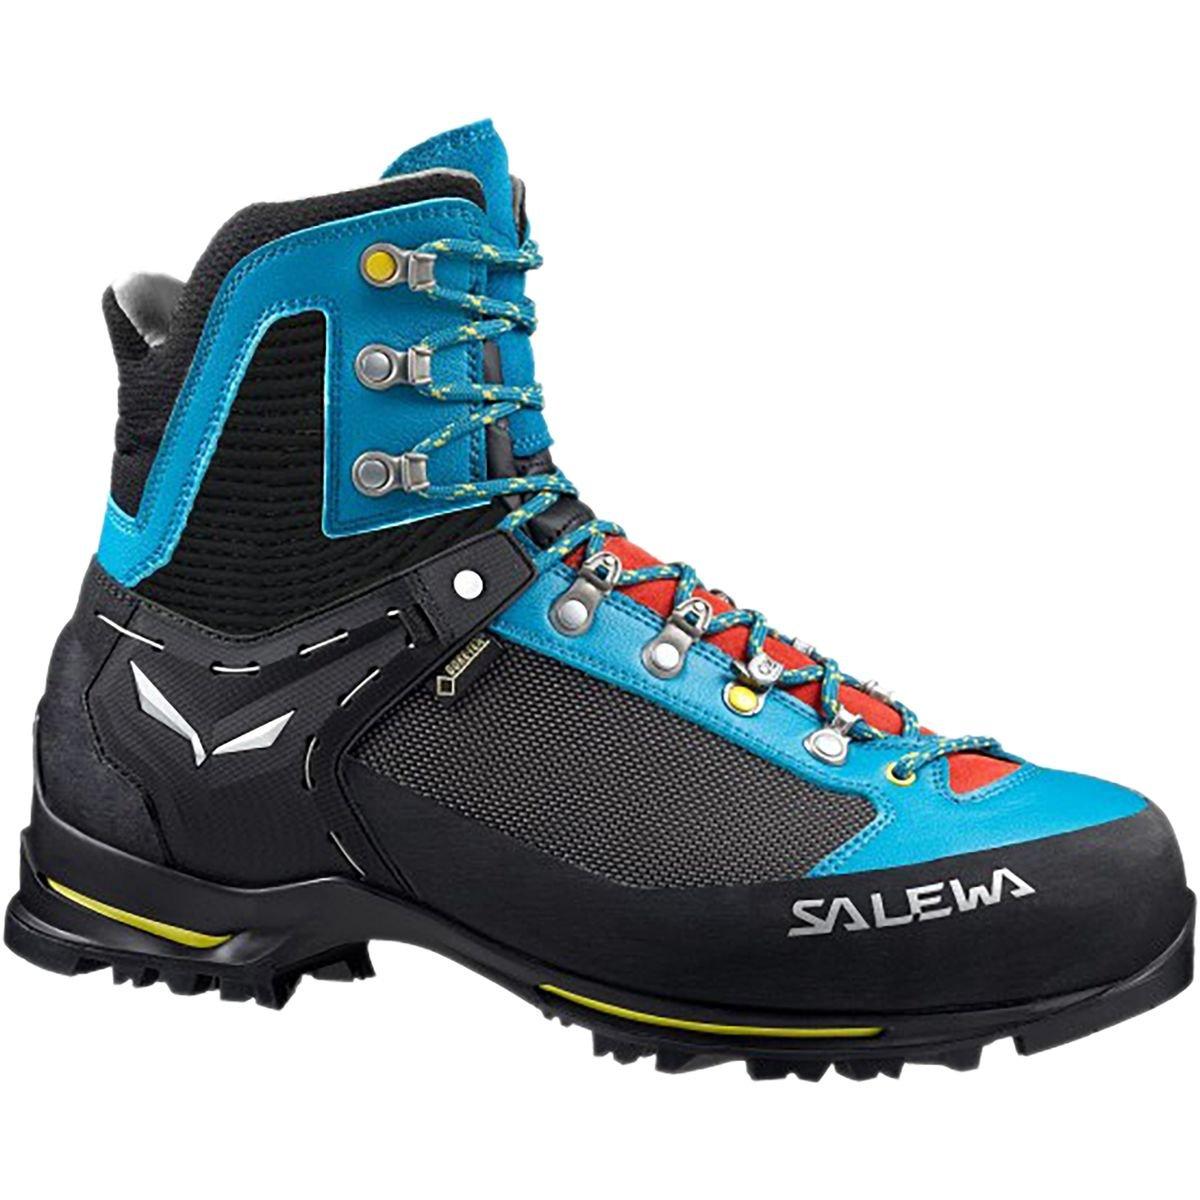 Salewa Women's Raven 2 Gtx-W Mountaineering Boot, Ocean/Ringlo, 8.5 D US